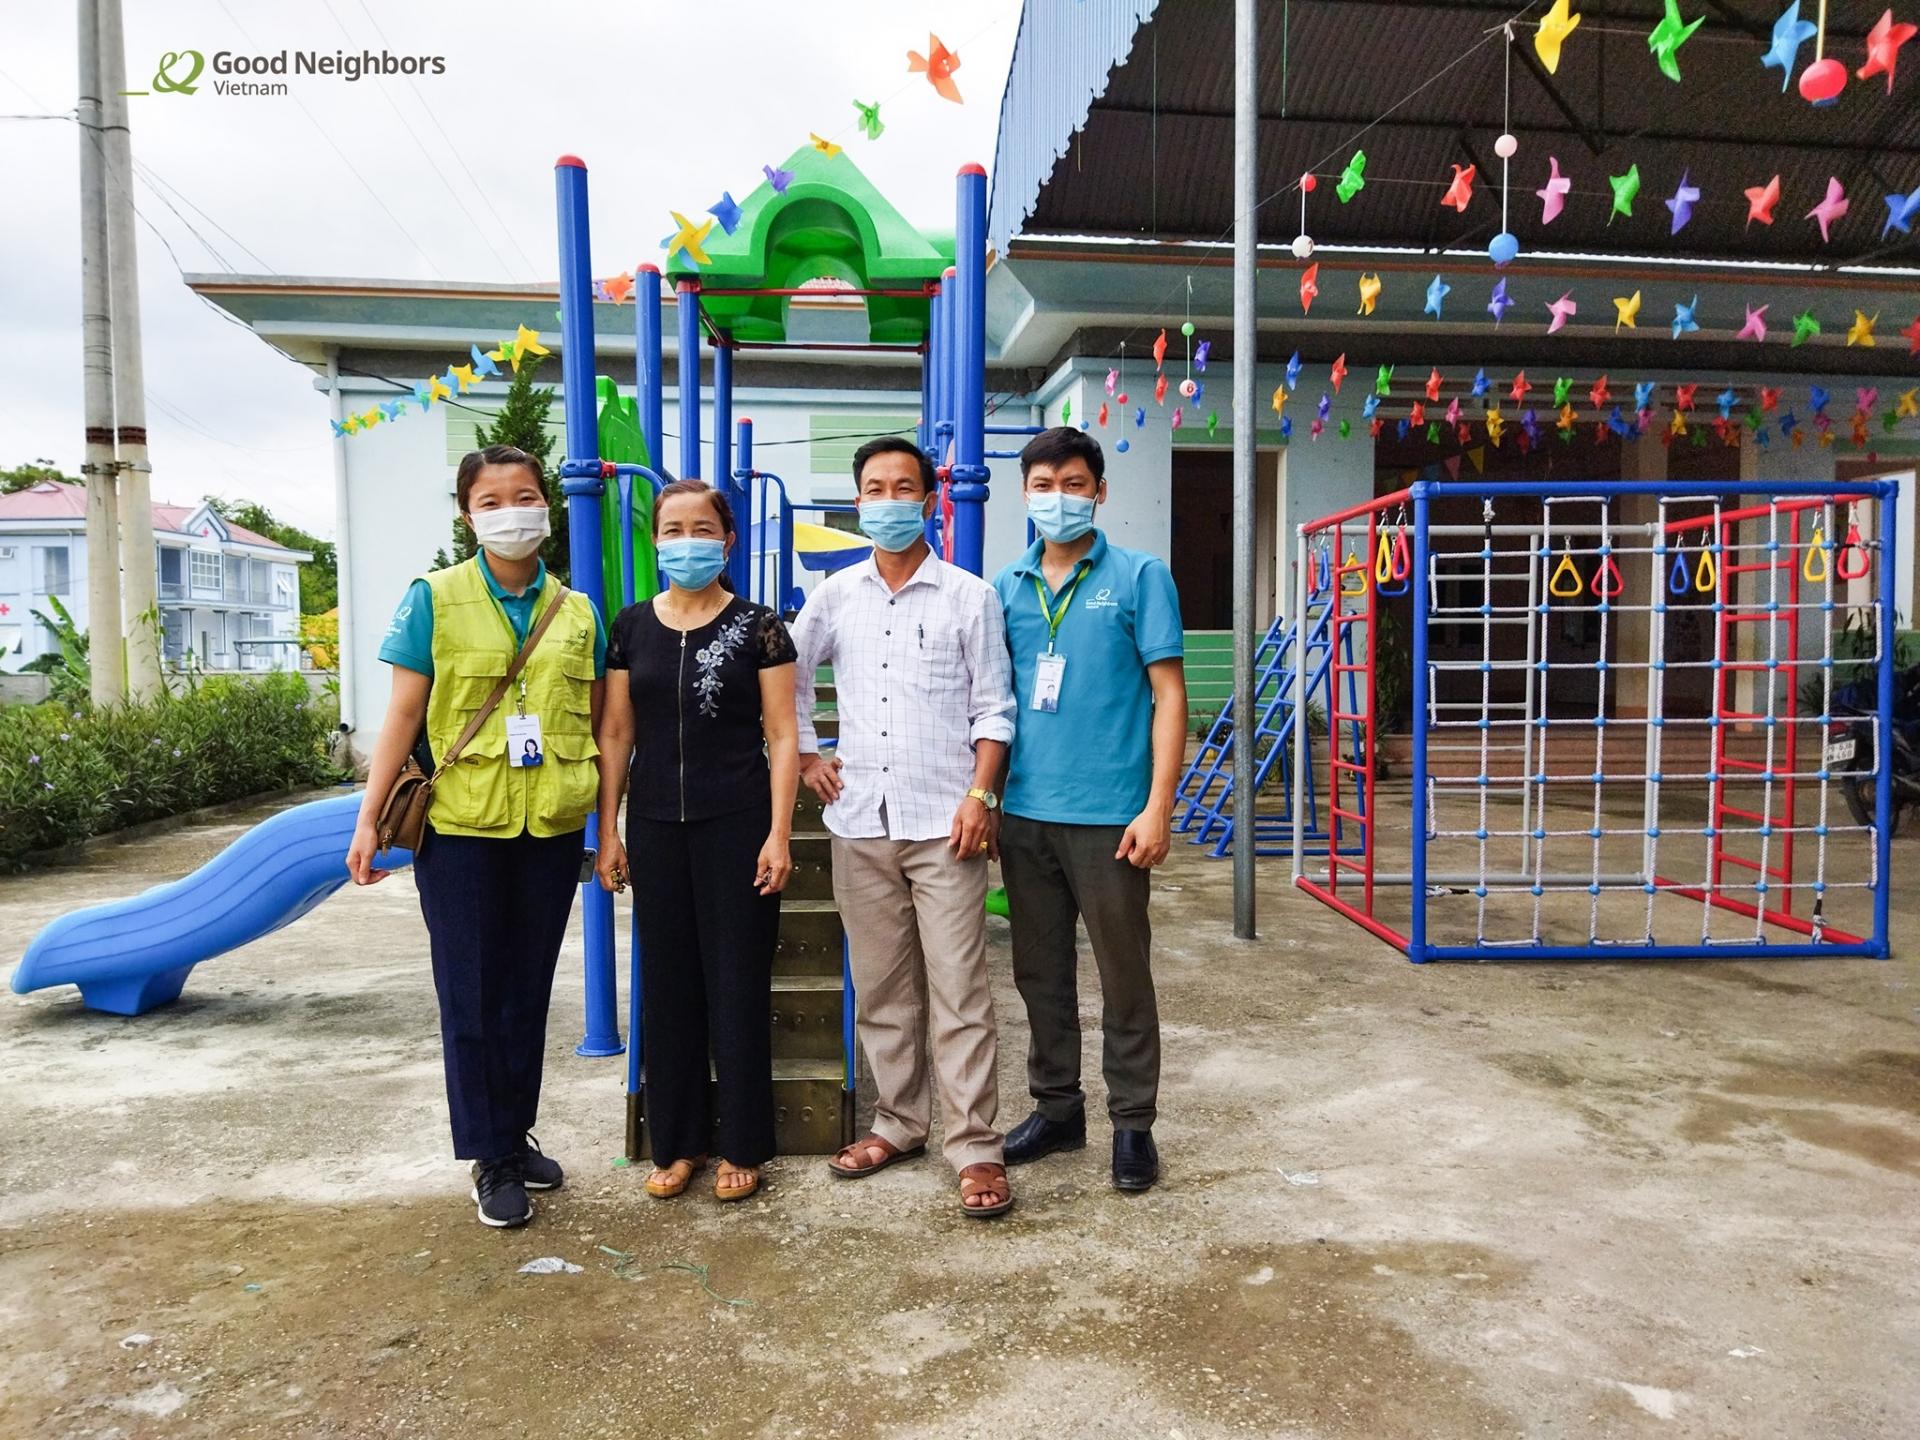 Korean NGO supports playground equipment for Tuyen Quang's kindergarten